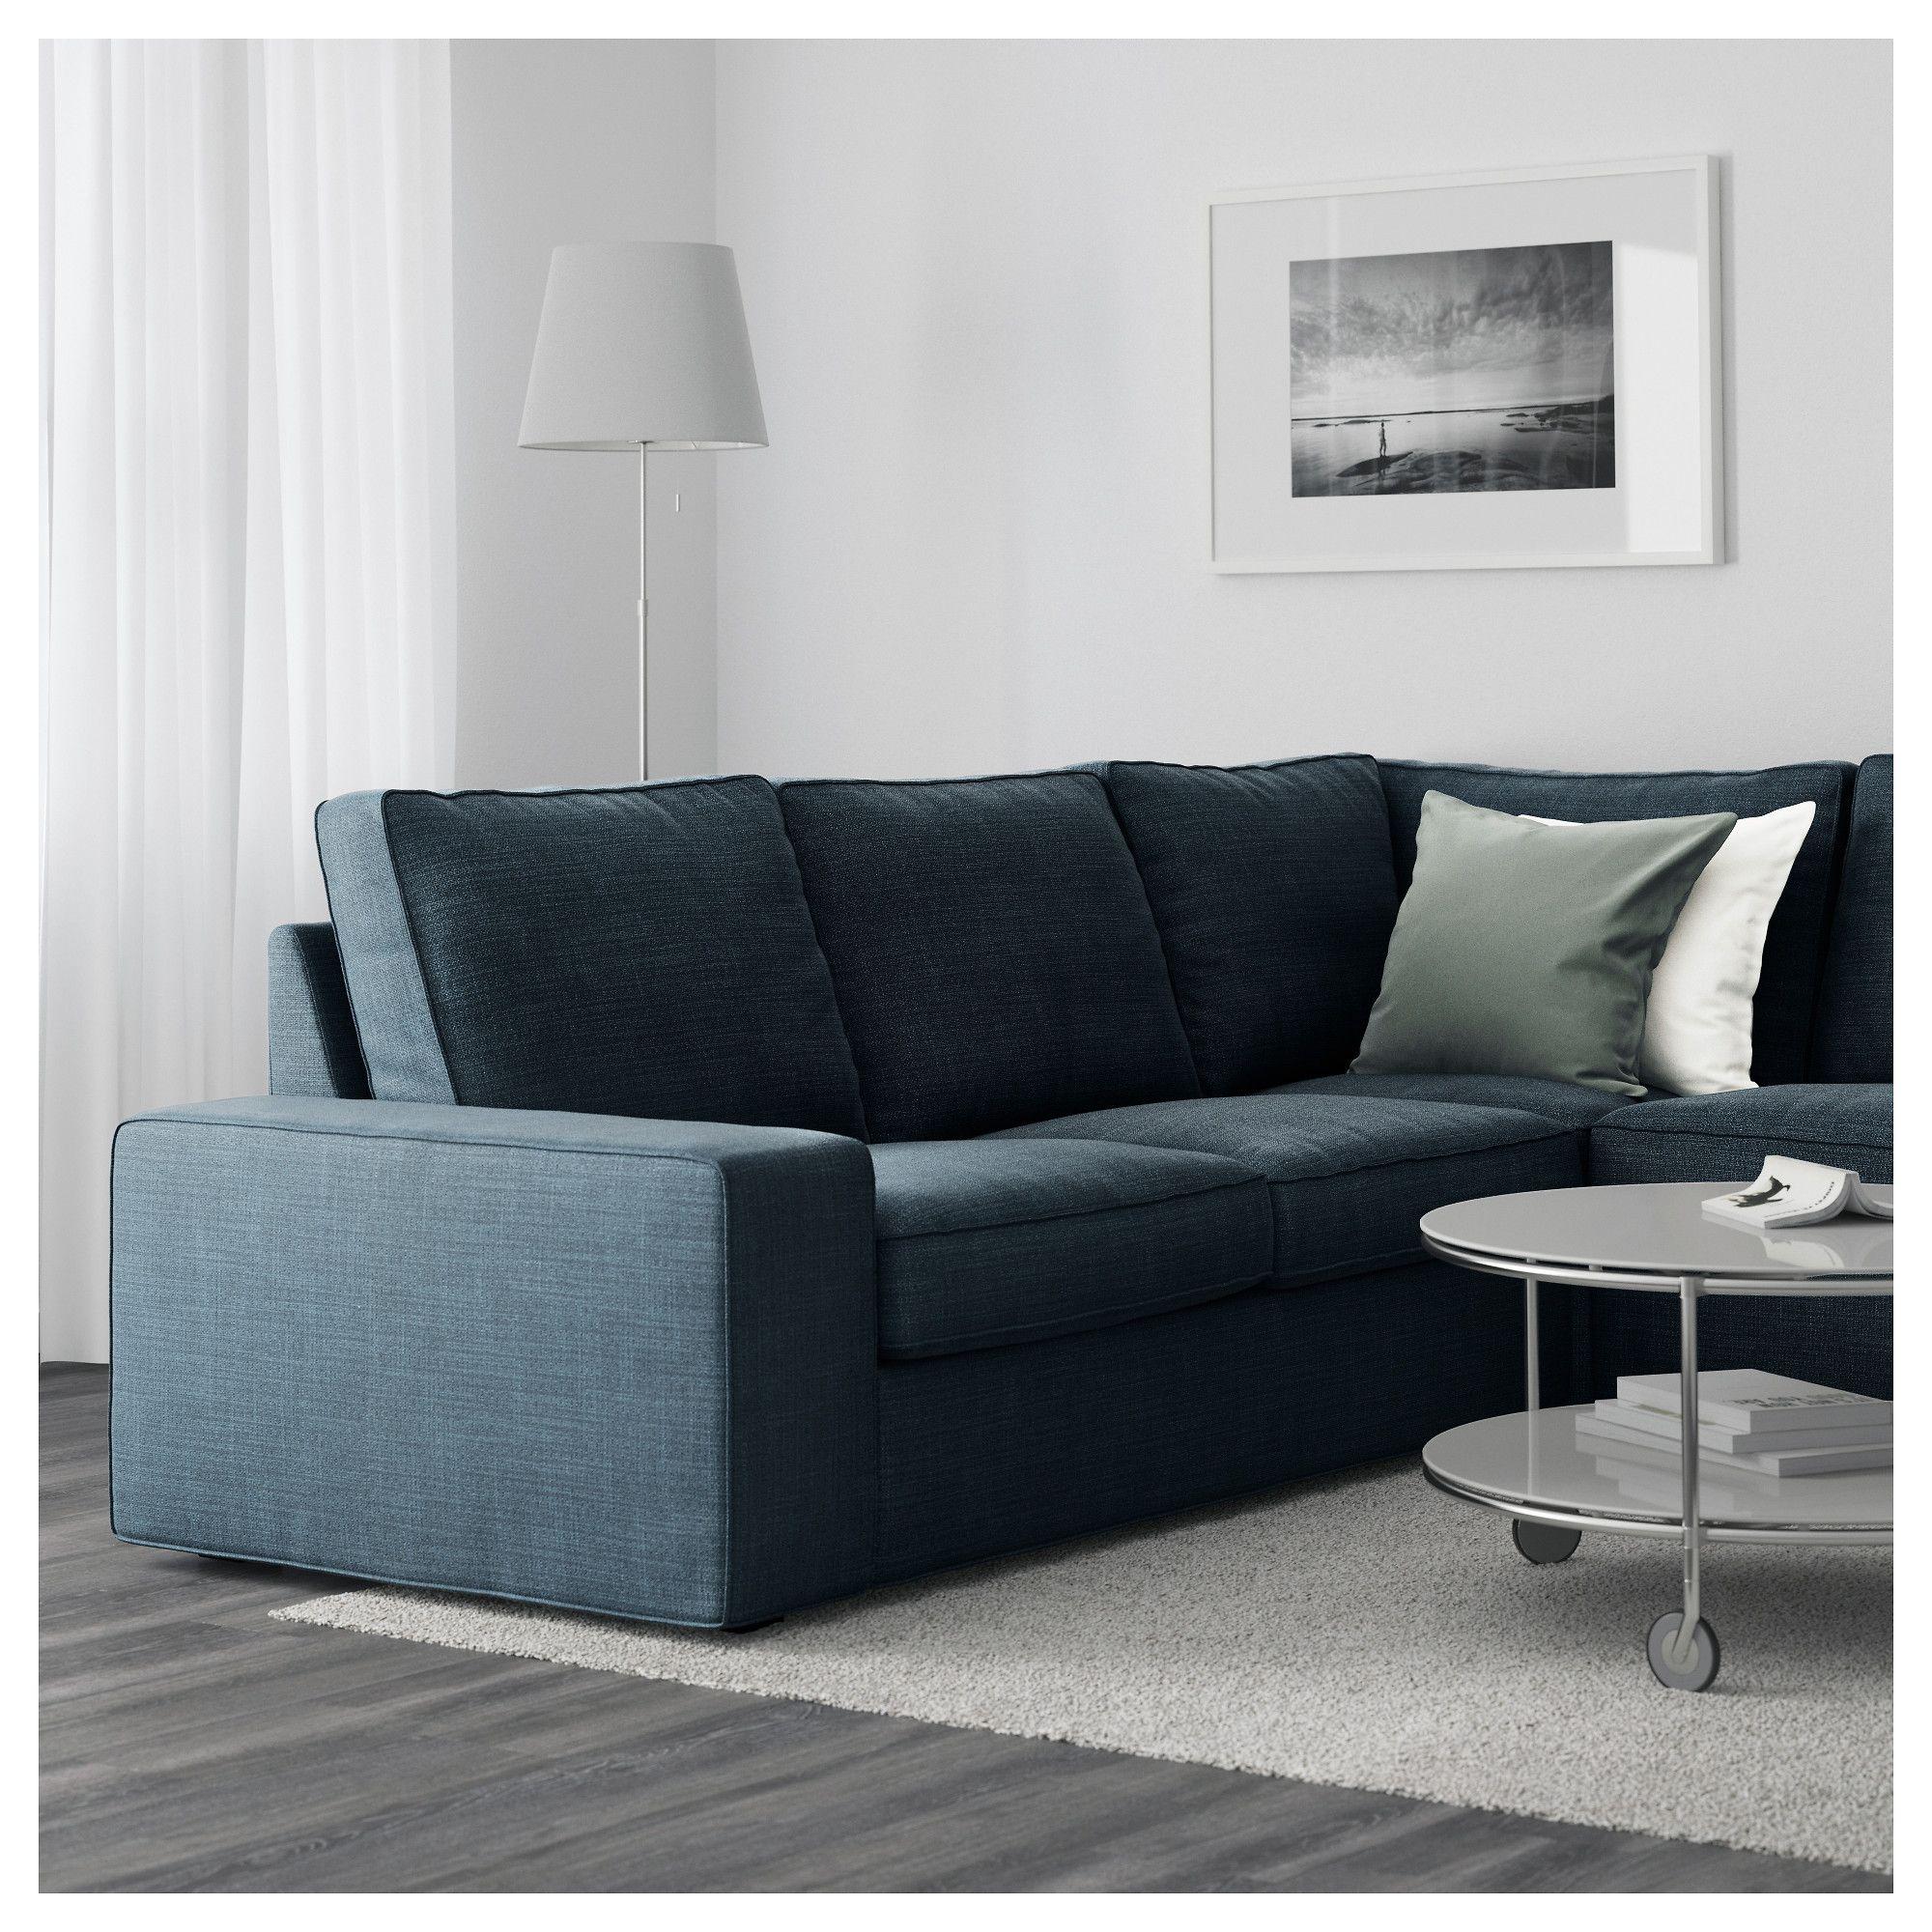 Kivik Sectional 5 Seat Corner With Chaise Hillared Dark Blue